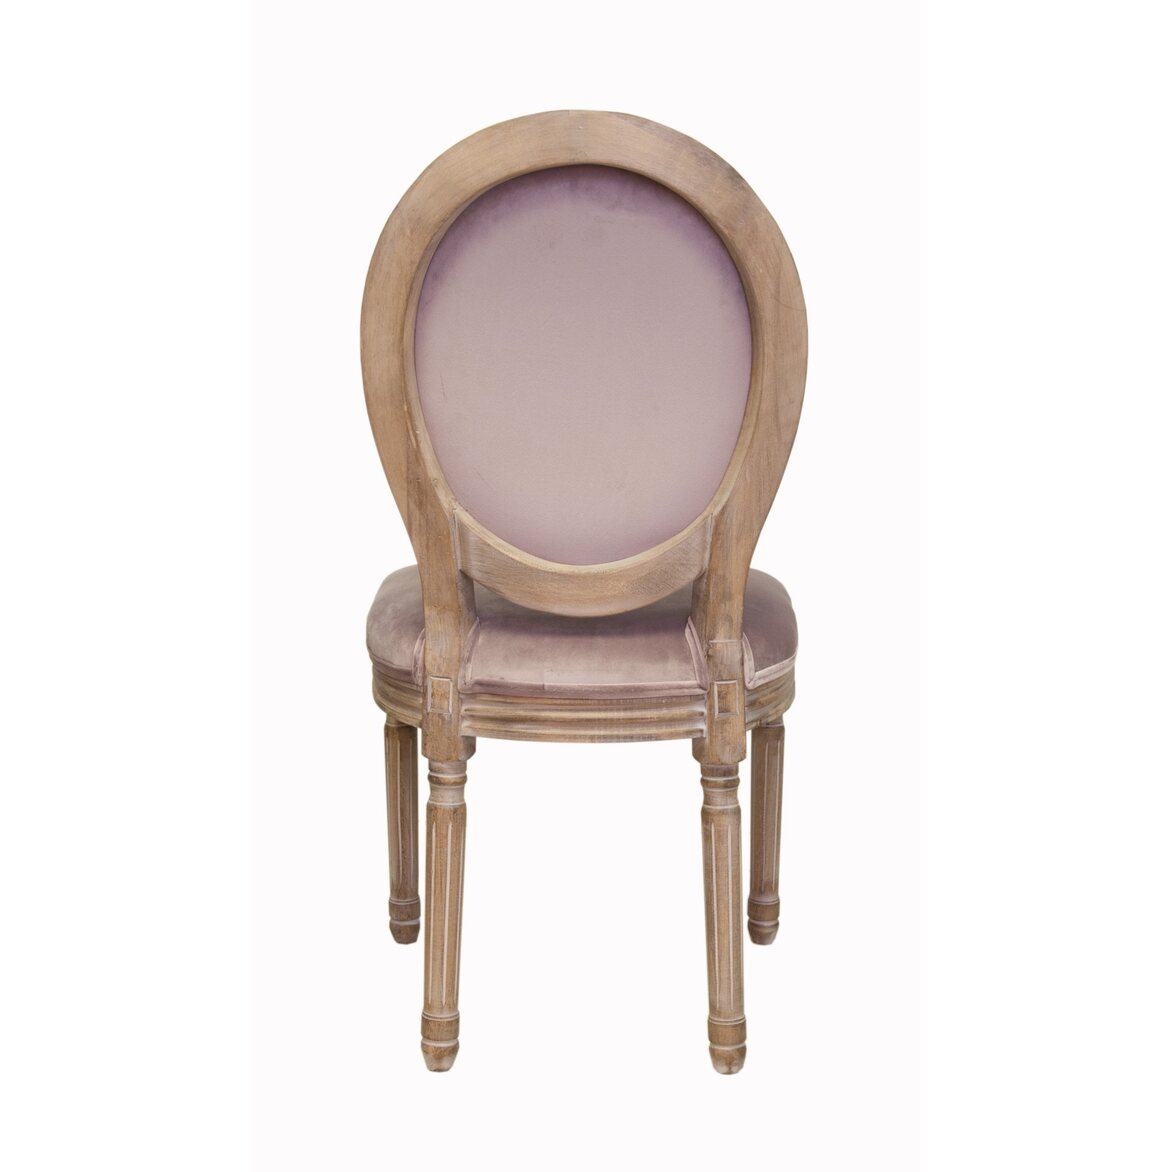 Стул Volker pink 3 | Обеденные стулья Kingsby